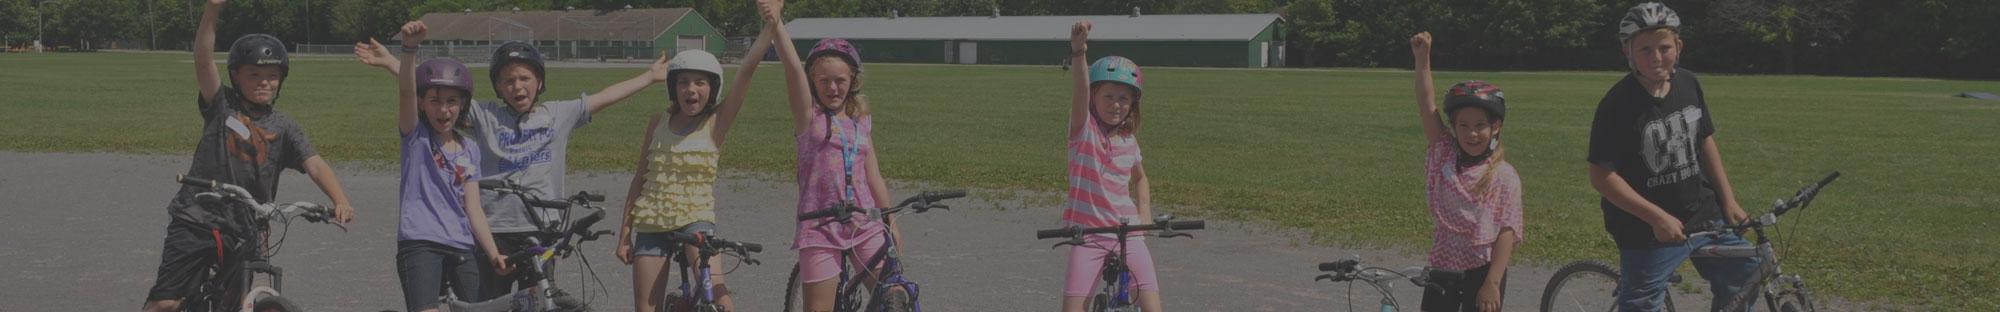 Kids on Bikes Celebrating